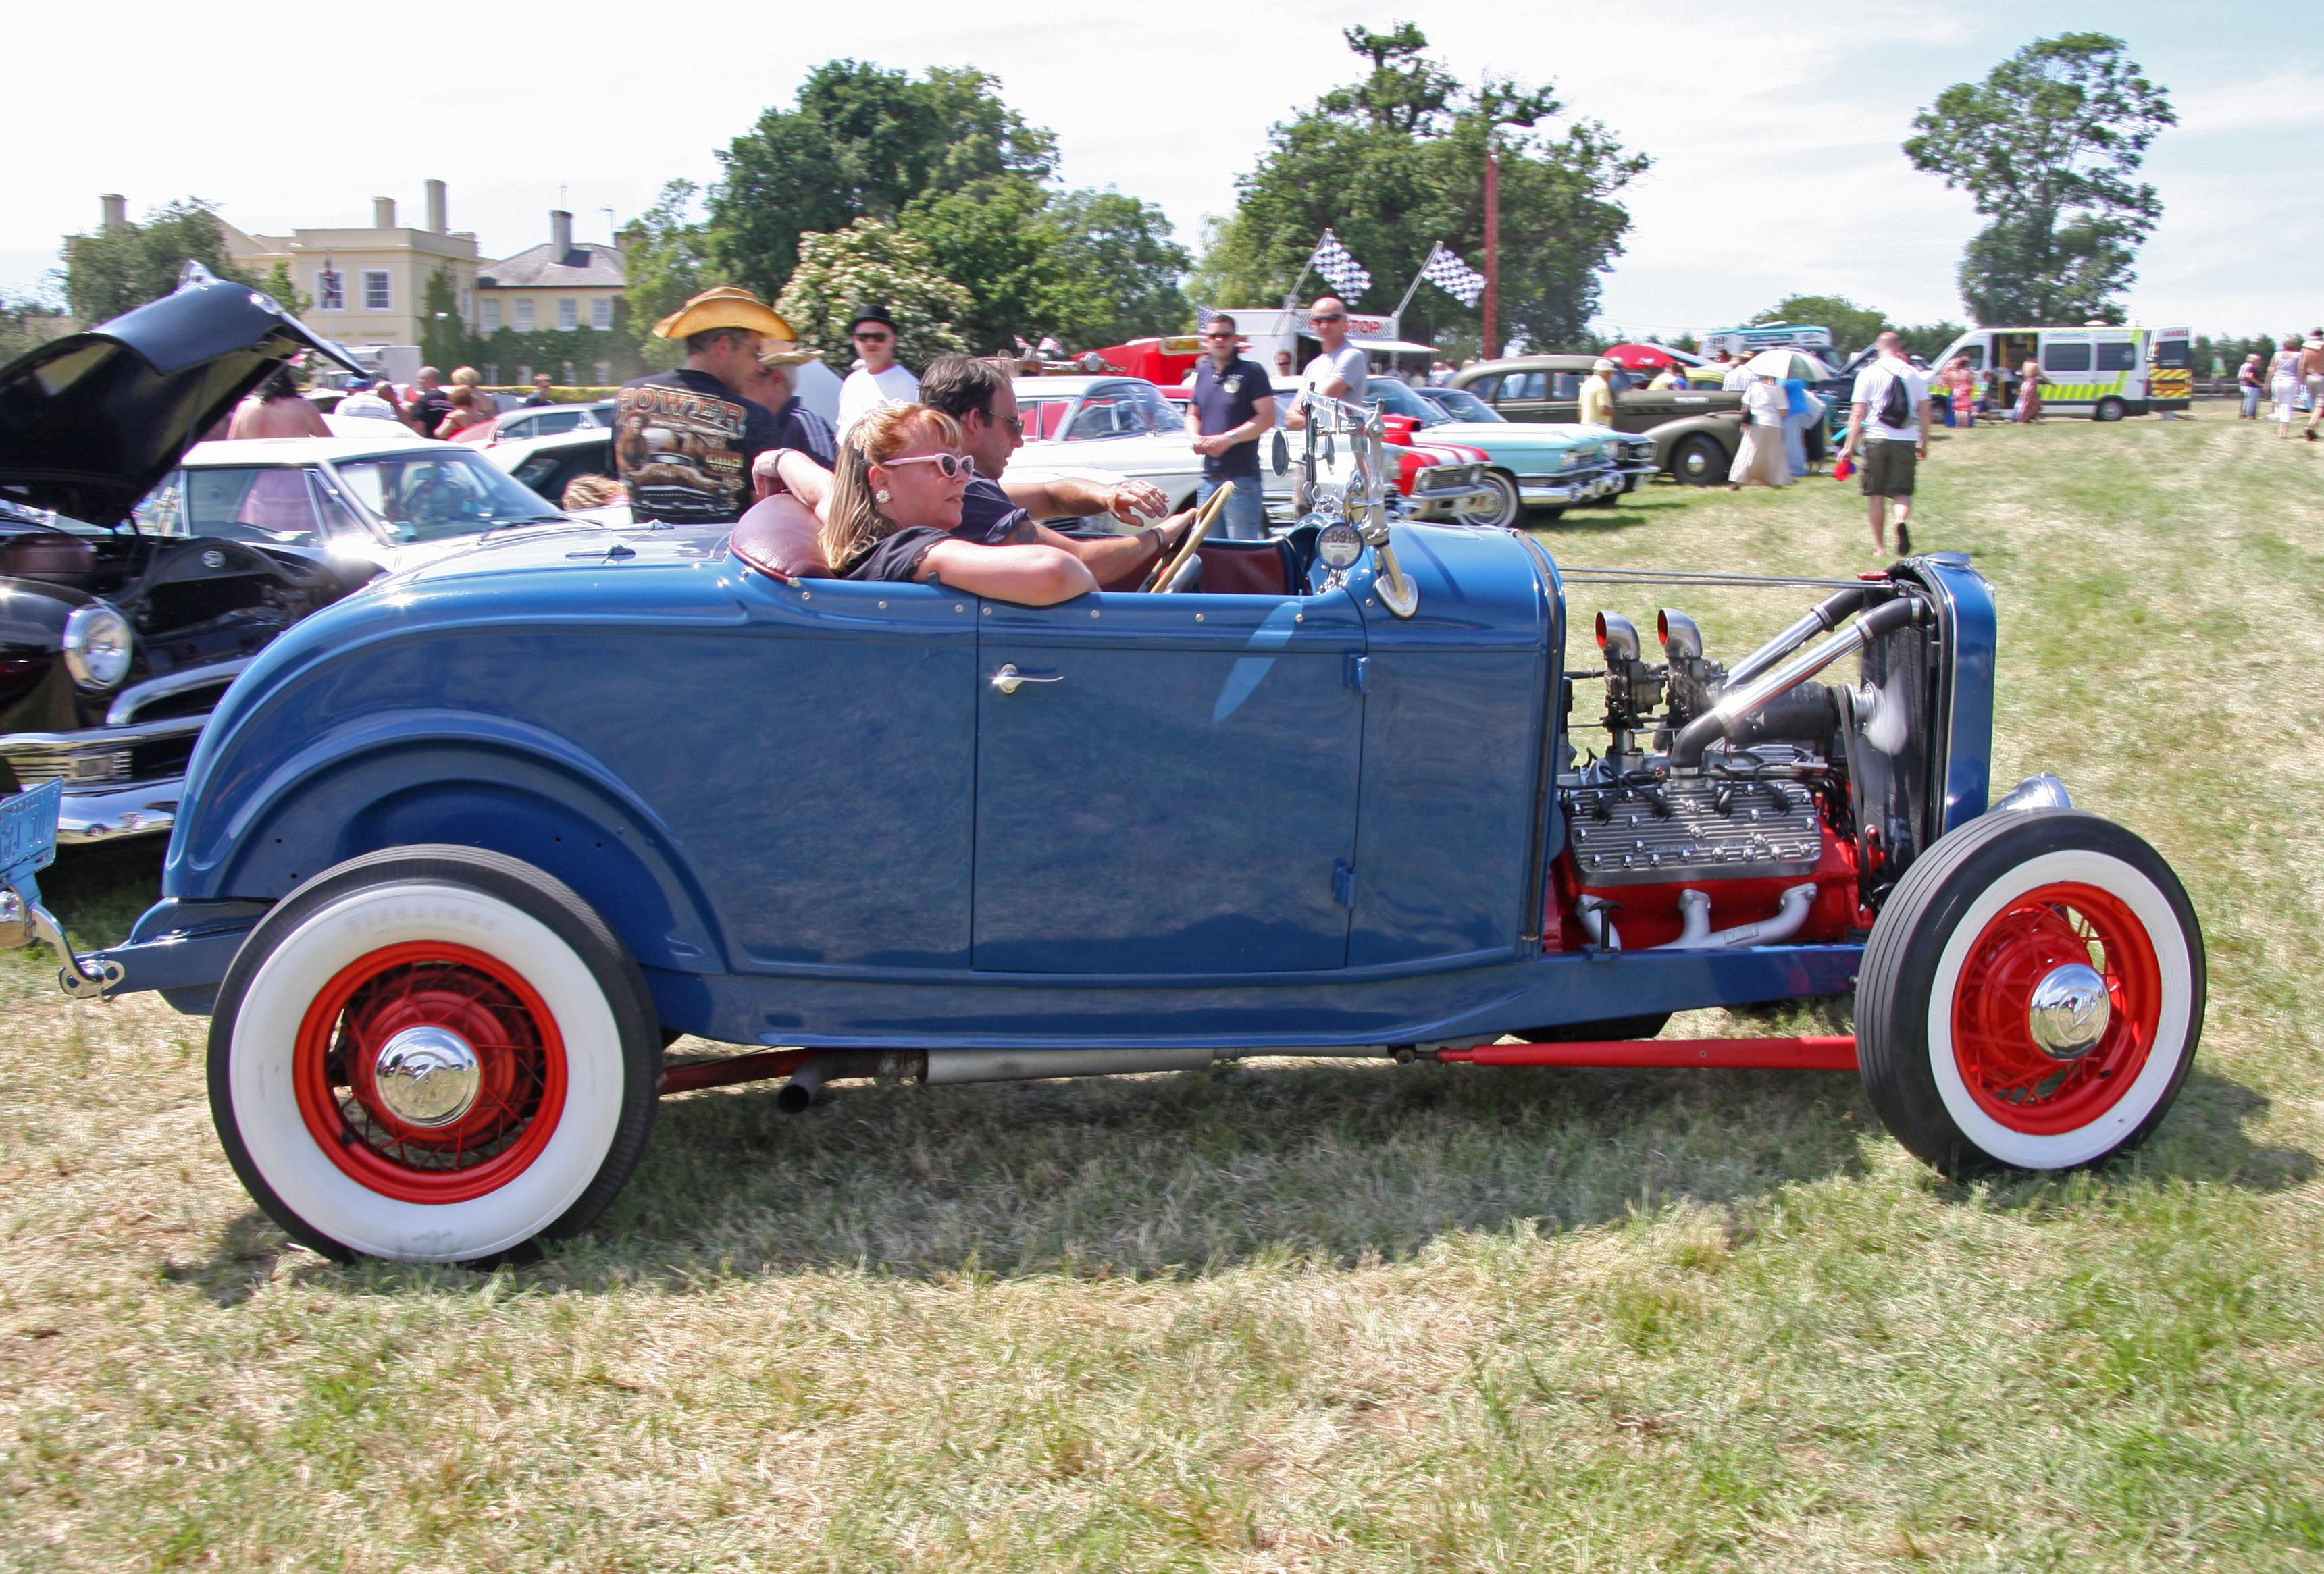 File:Ford Model B roadster hot rod - Flickr - exfordy (1).jpg ...